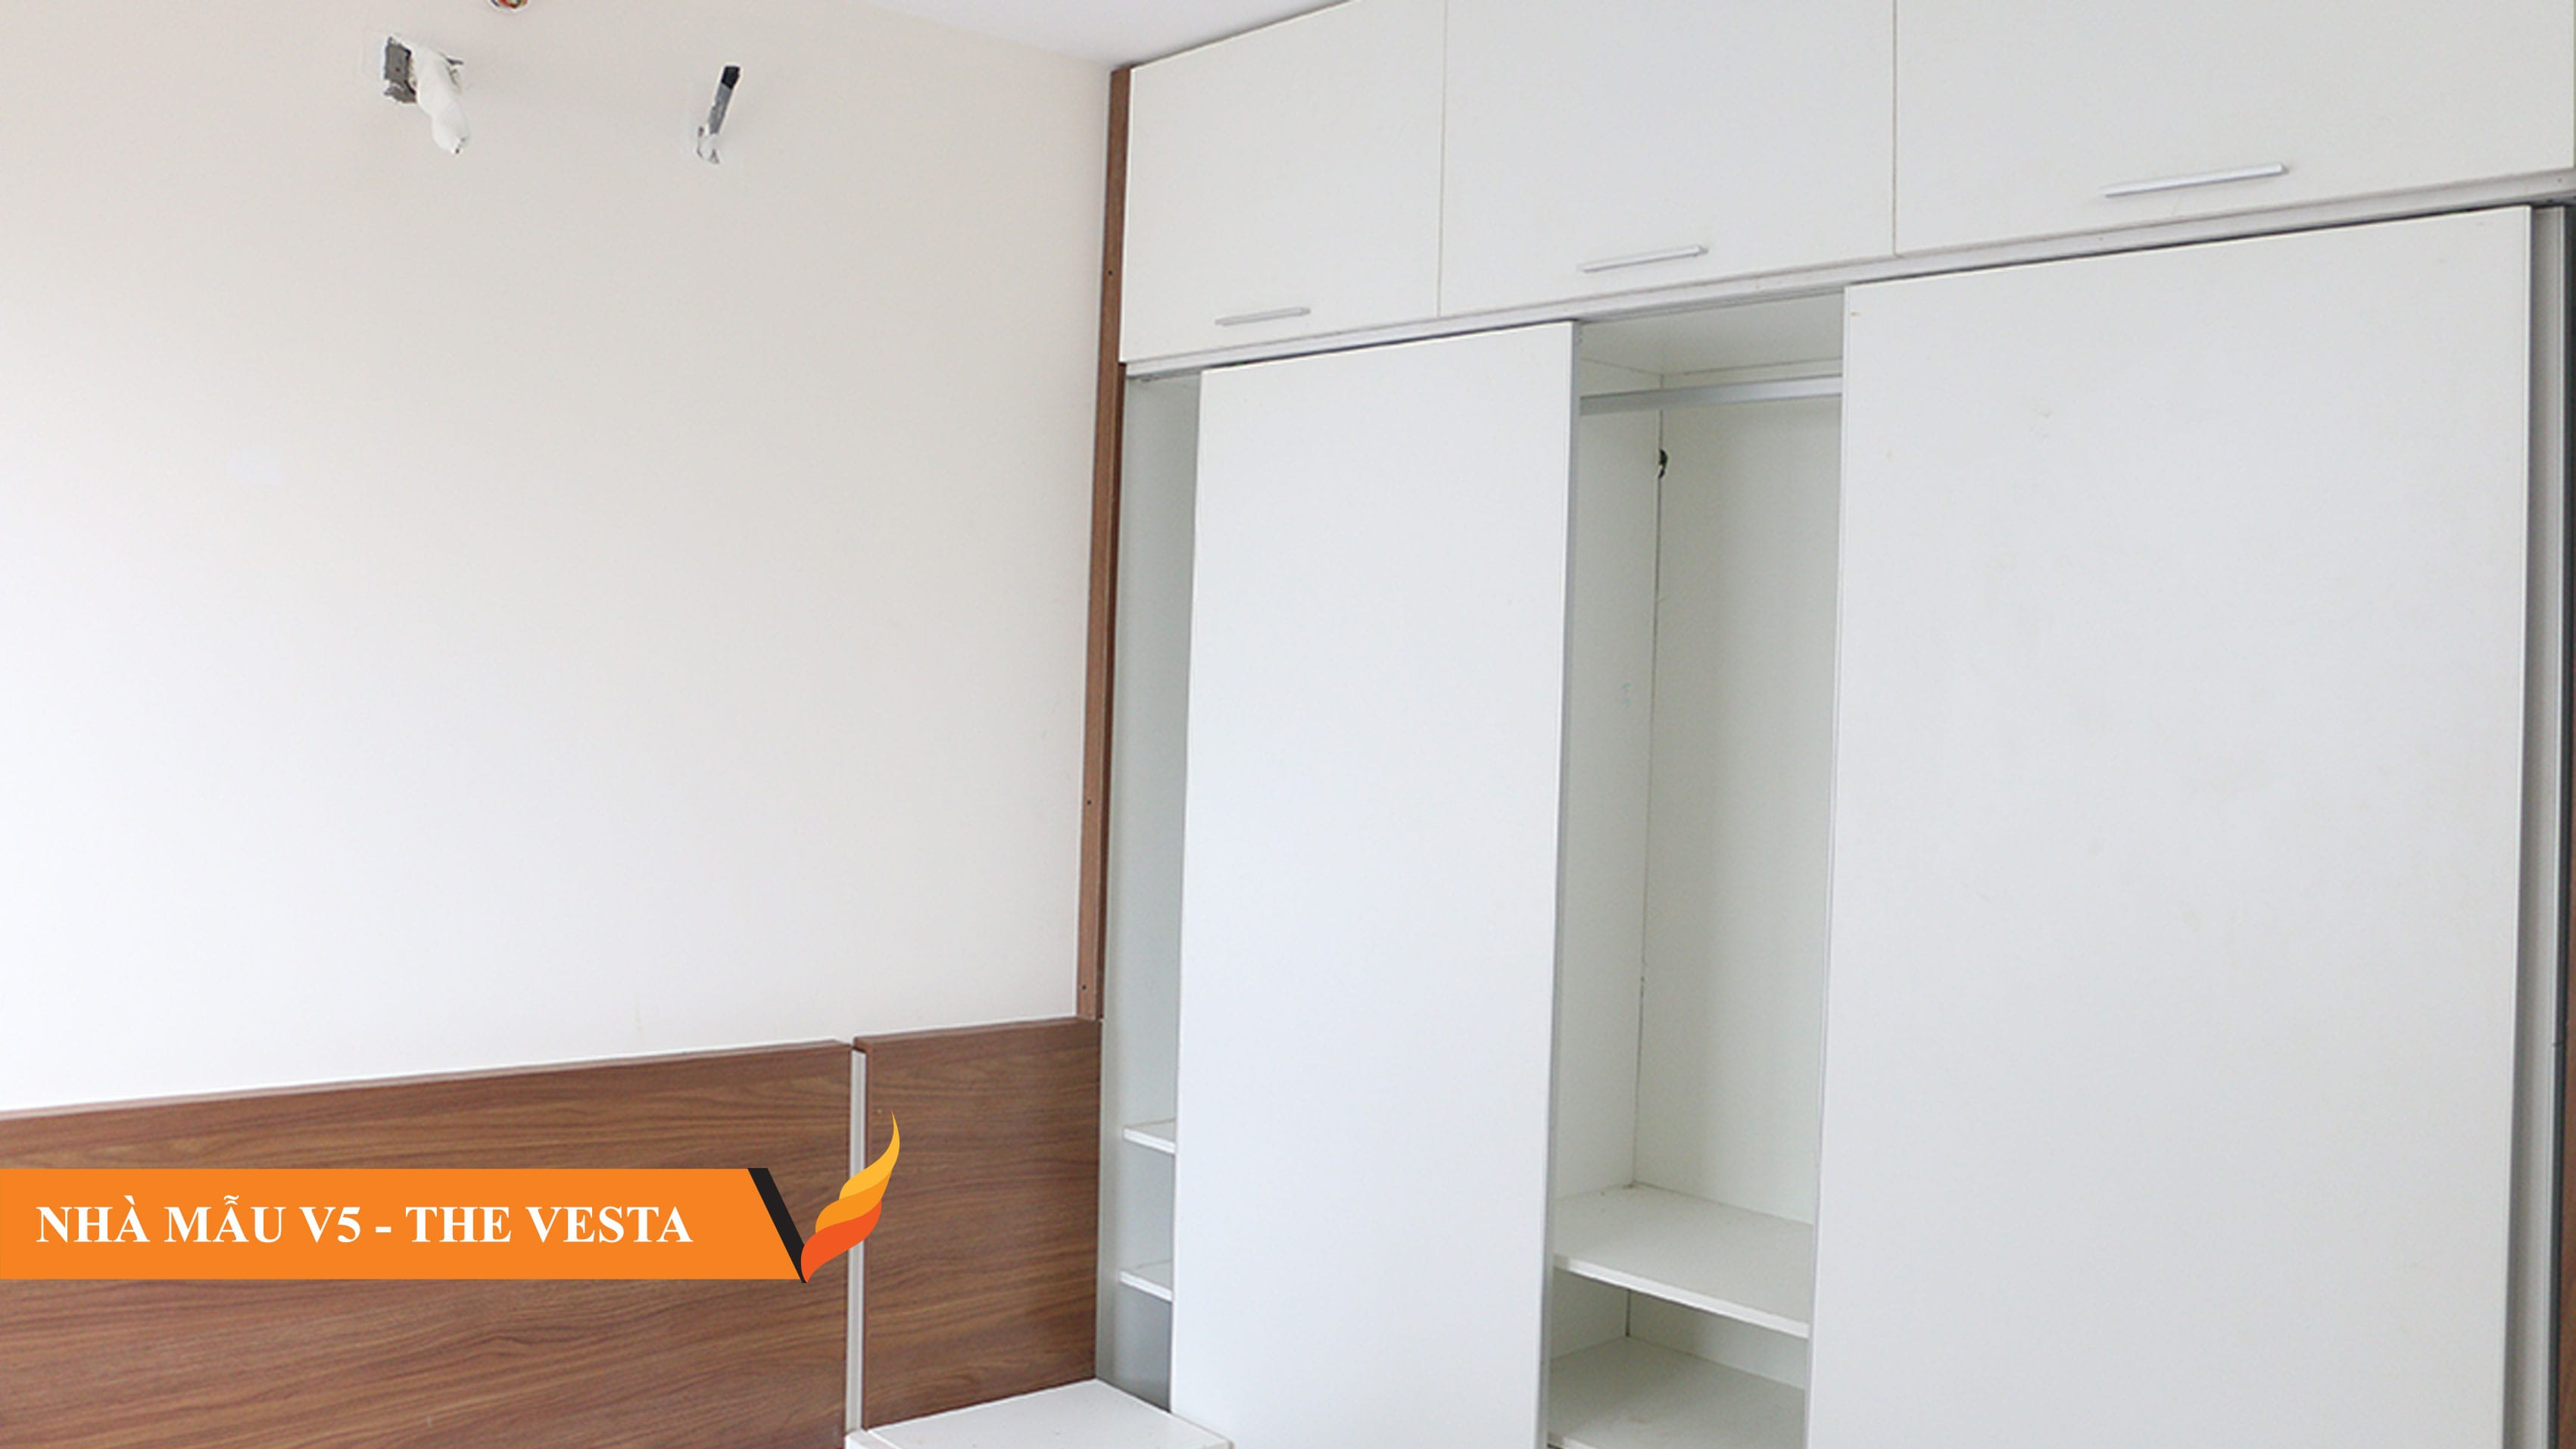 NHA-MAU-V5.1 The vesta thang 7-min